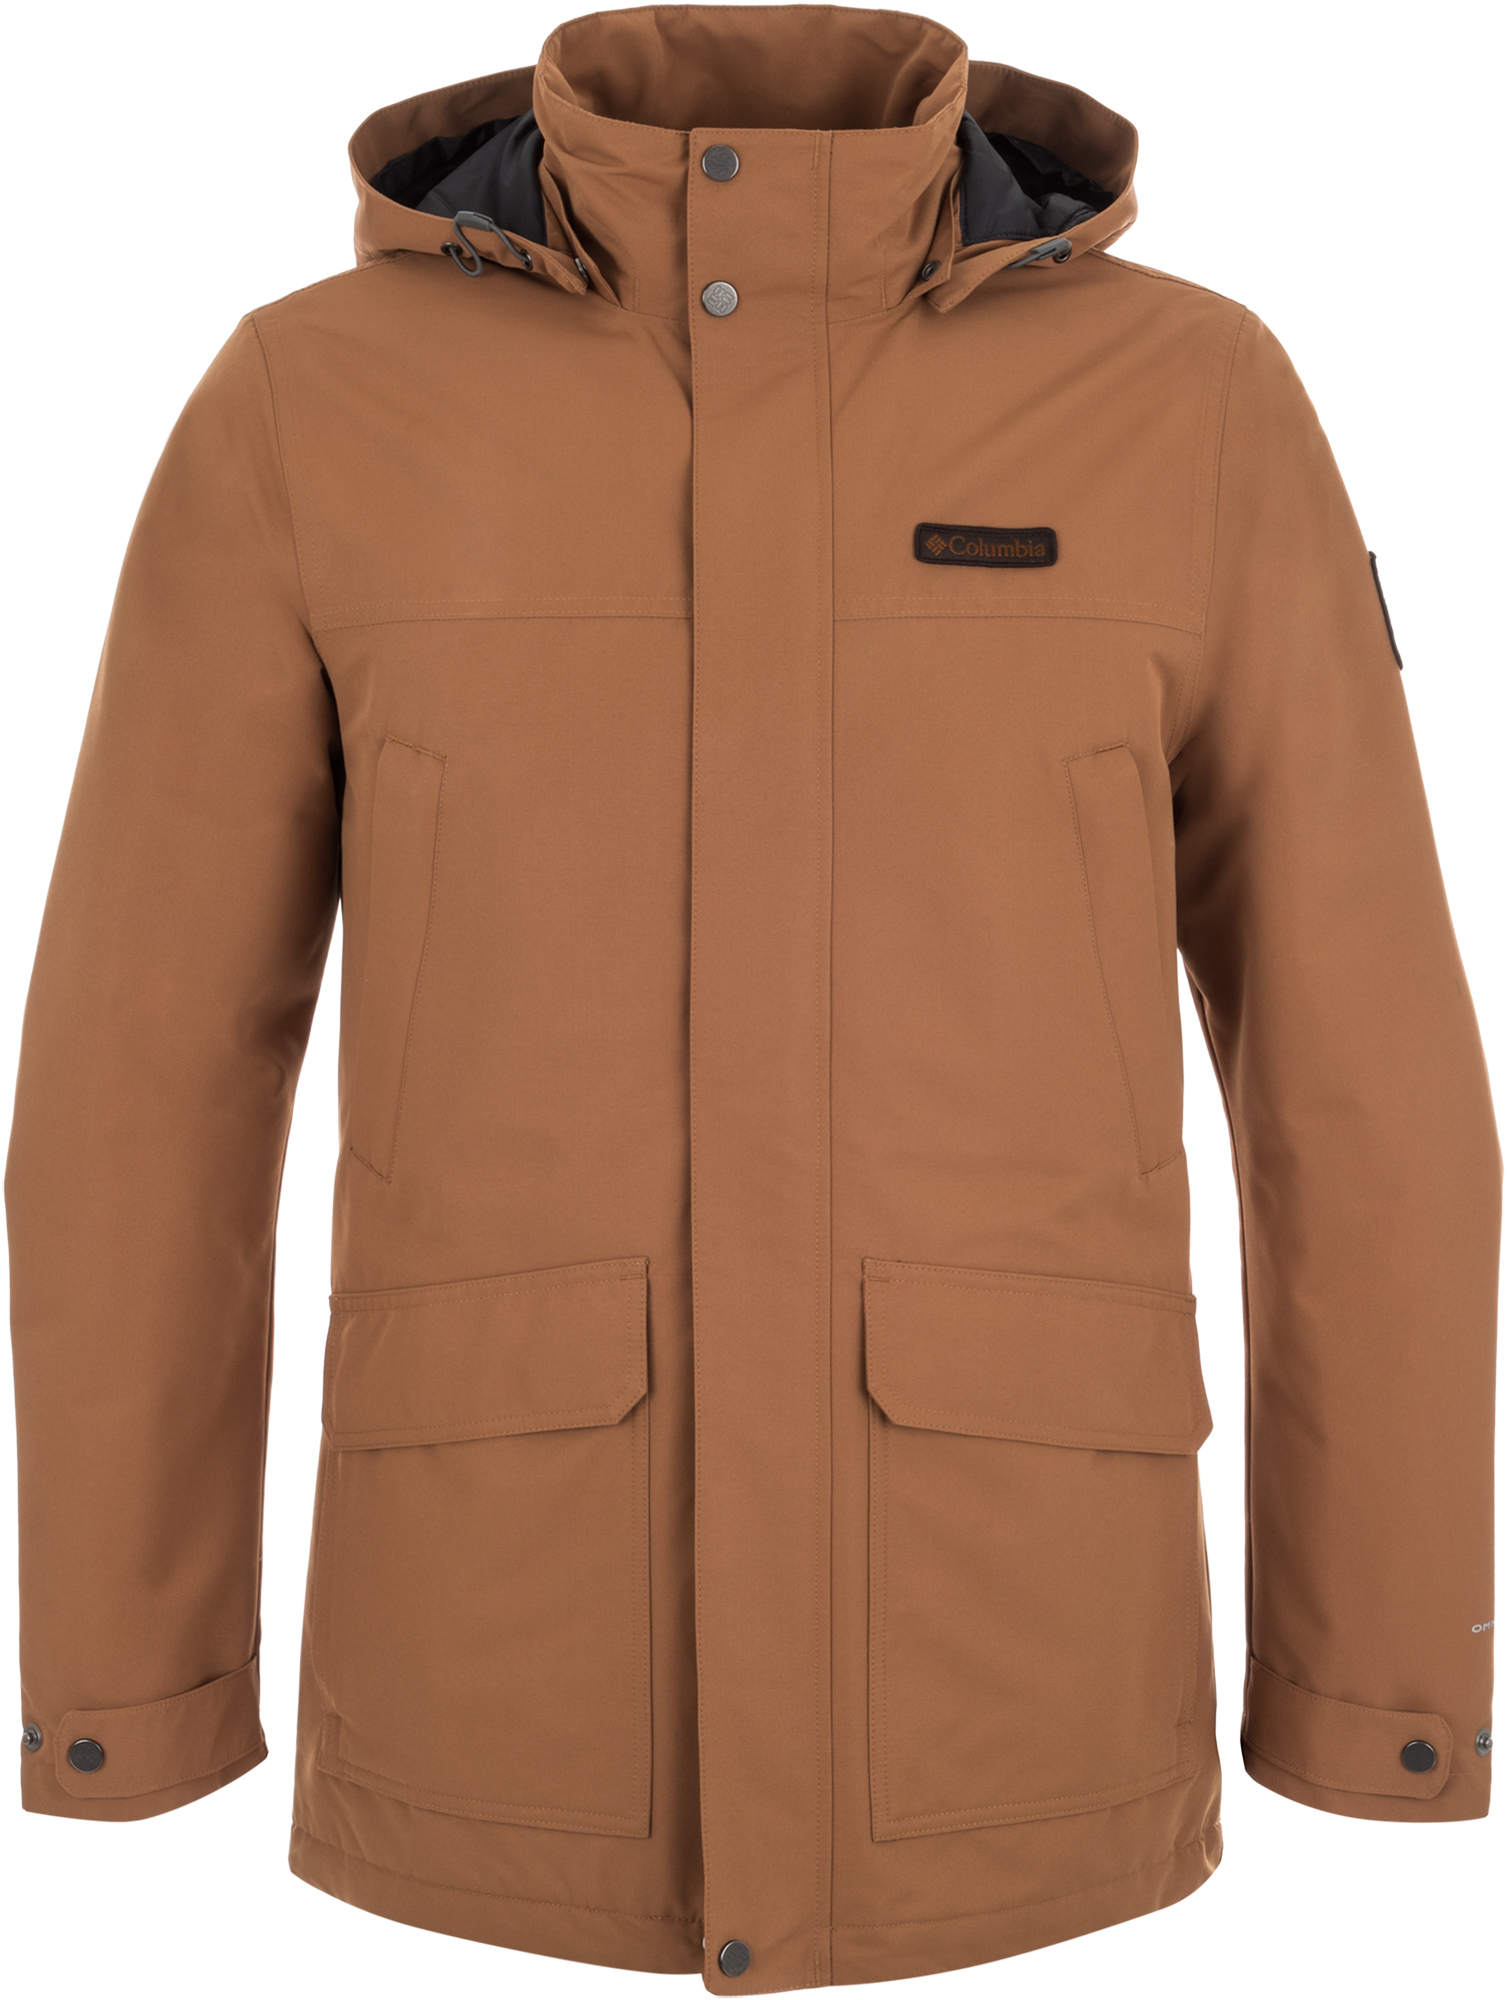 цена Columbia Куртка утепленная мужская Columbia Inverness, размер 48-50 онлайн в 2017 году